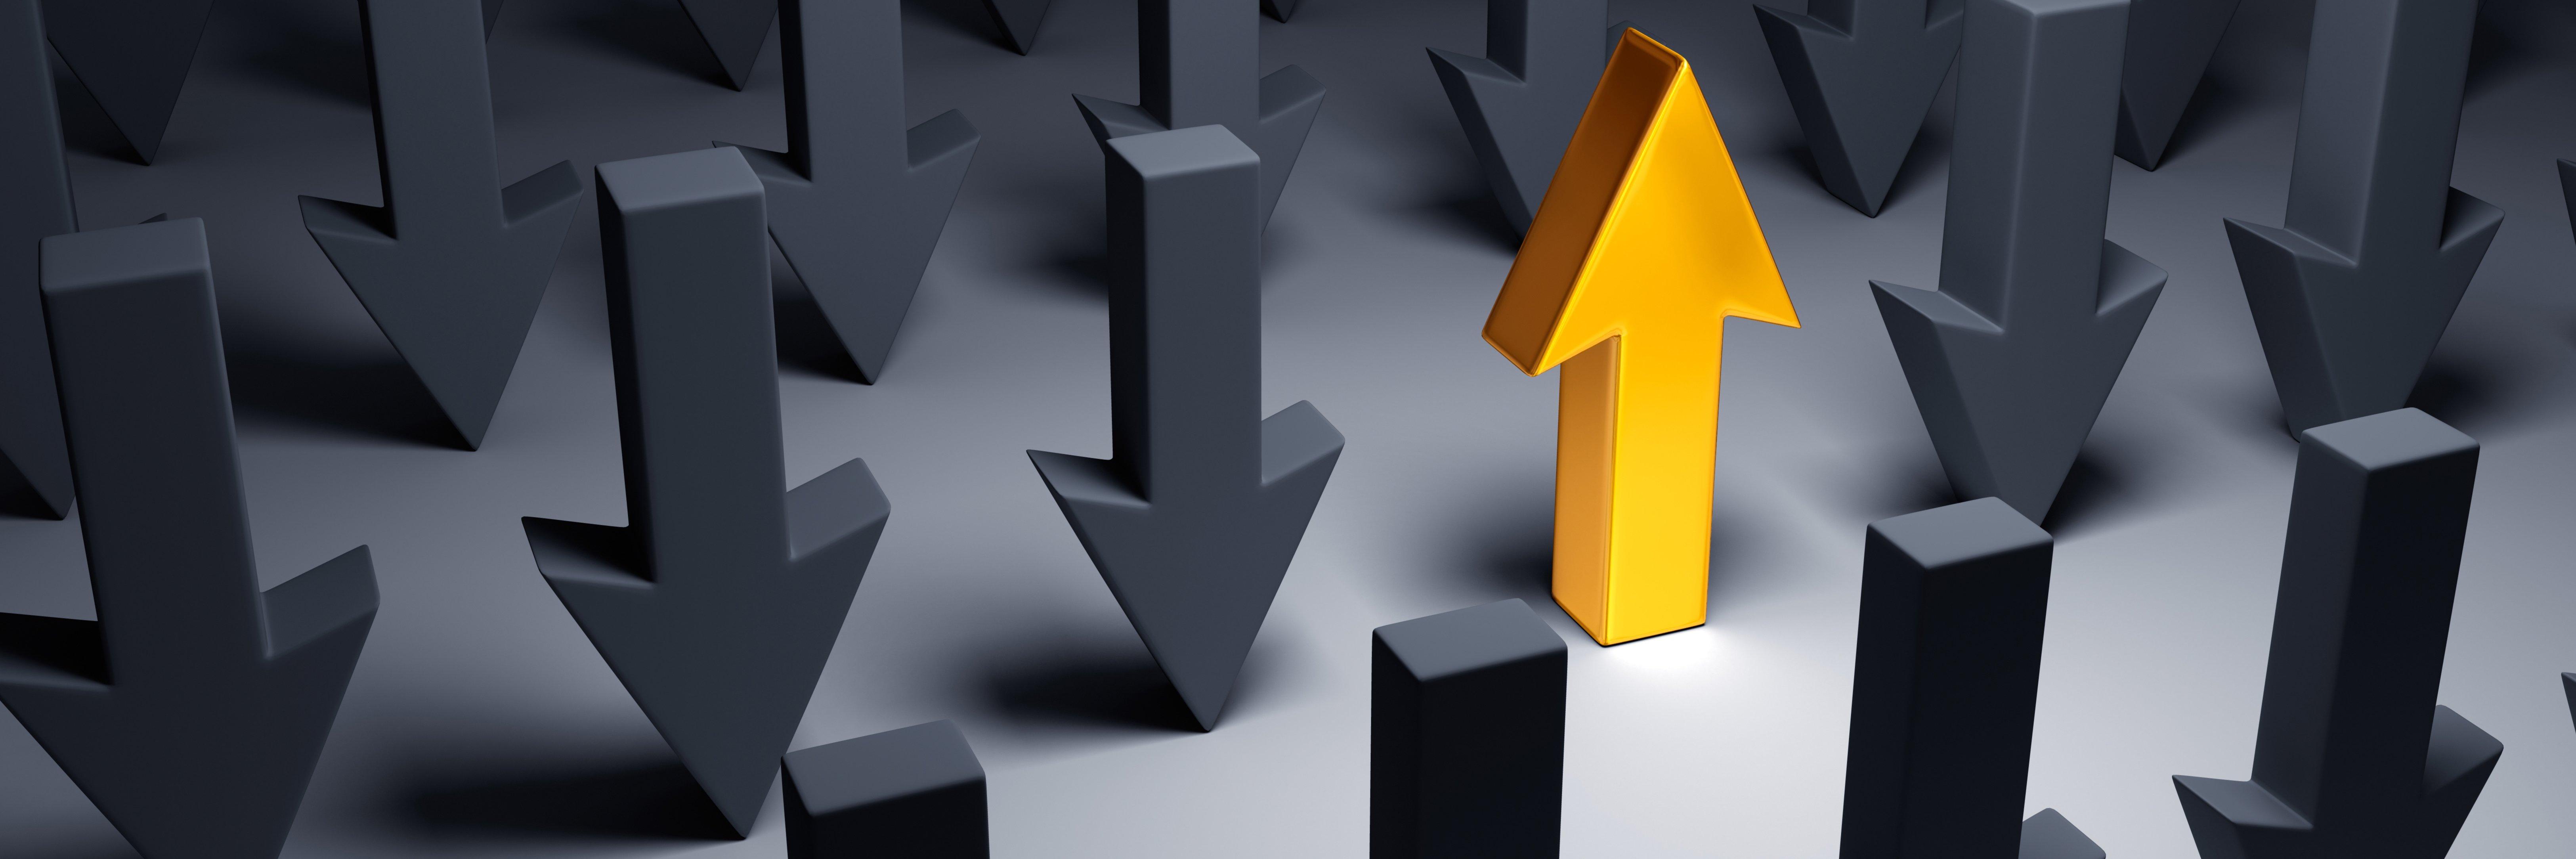 Dell set to buy storage company EMC